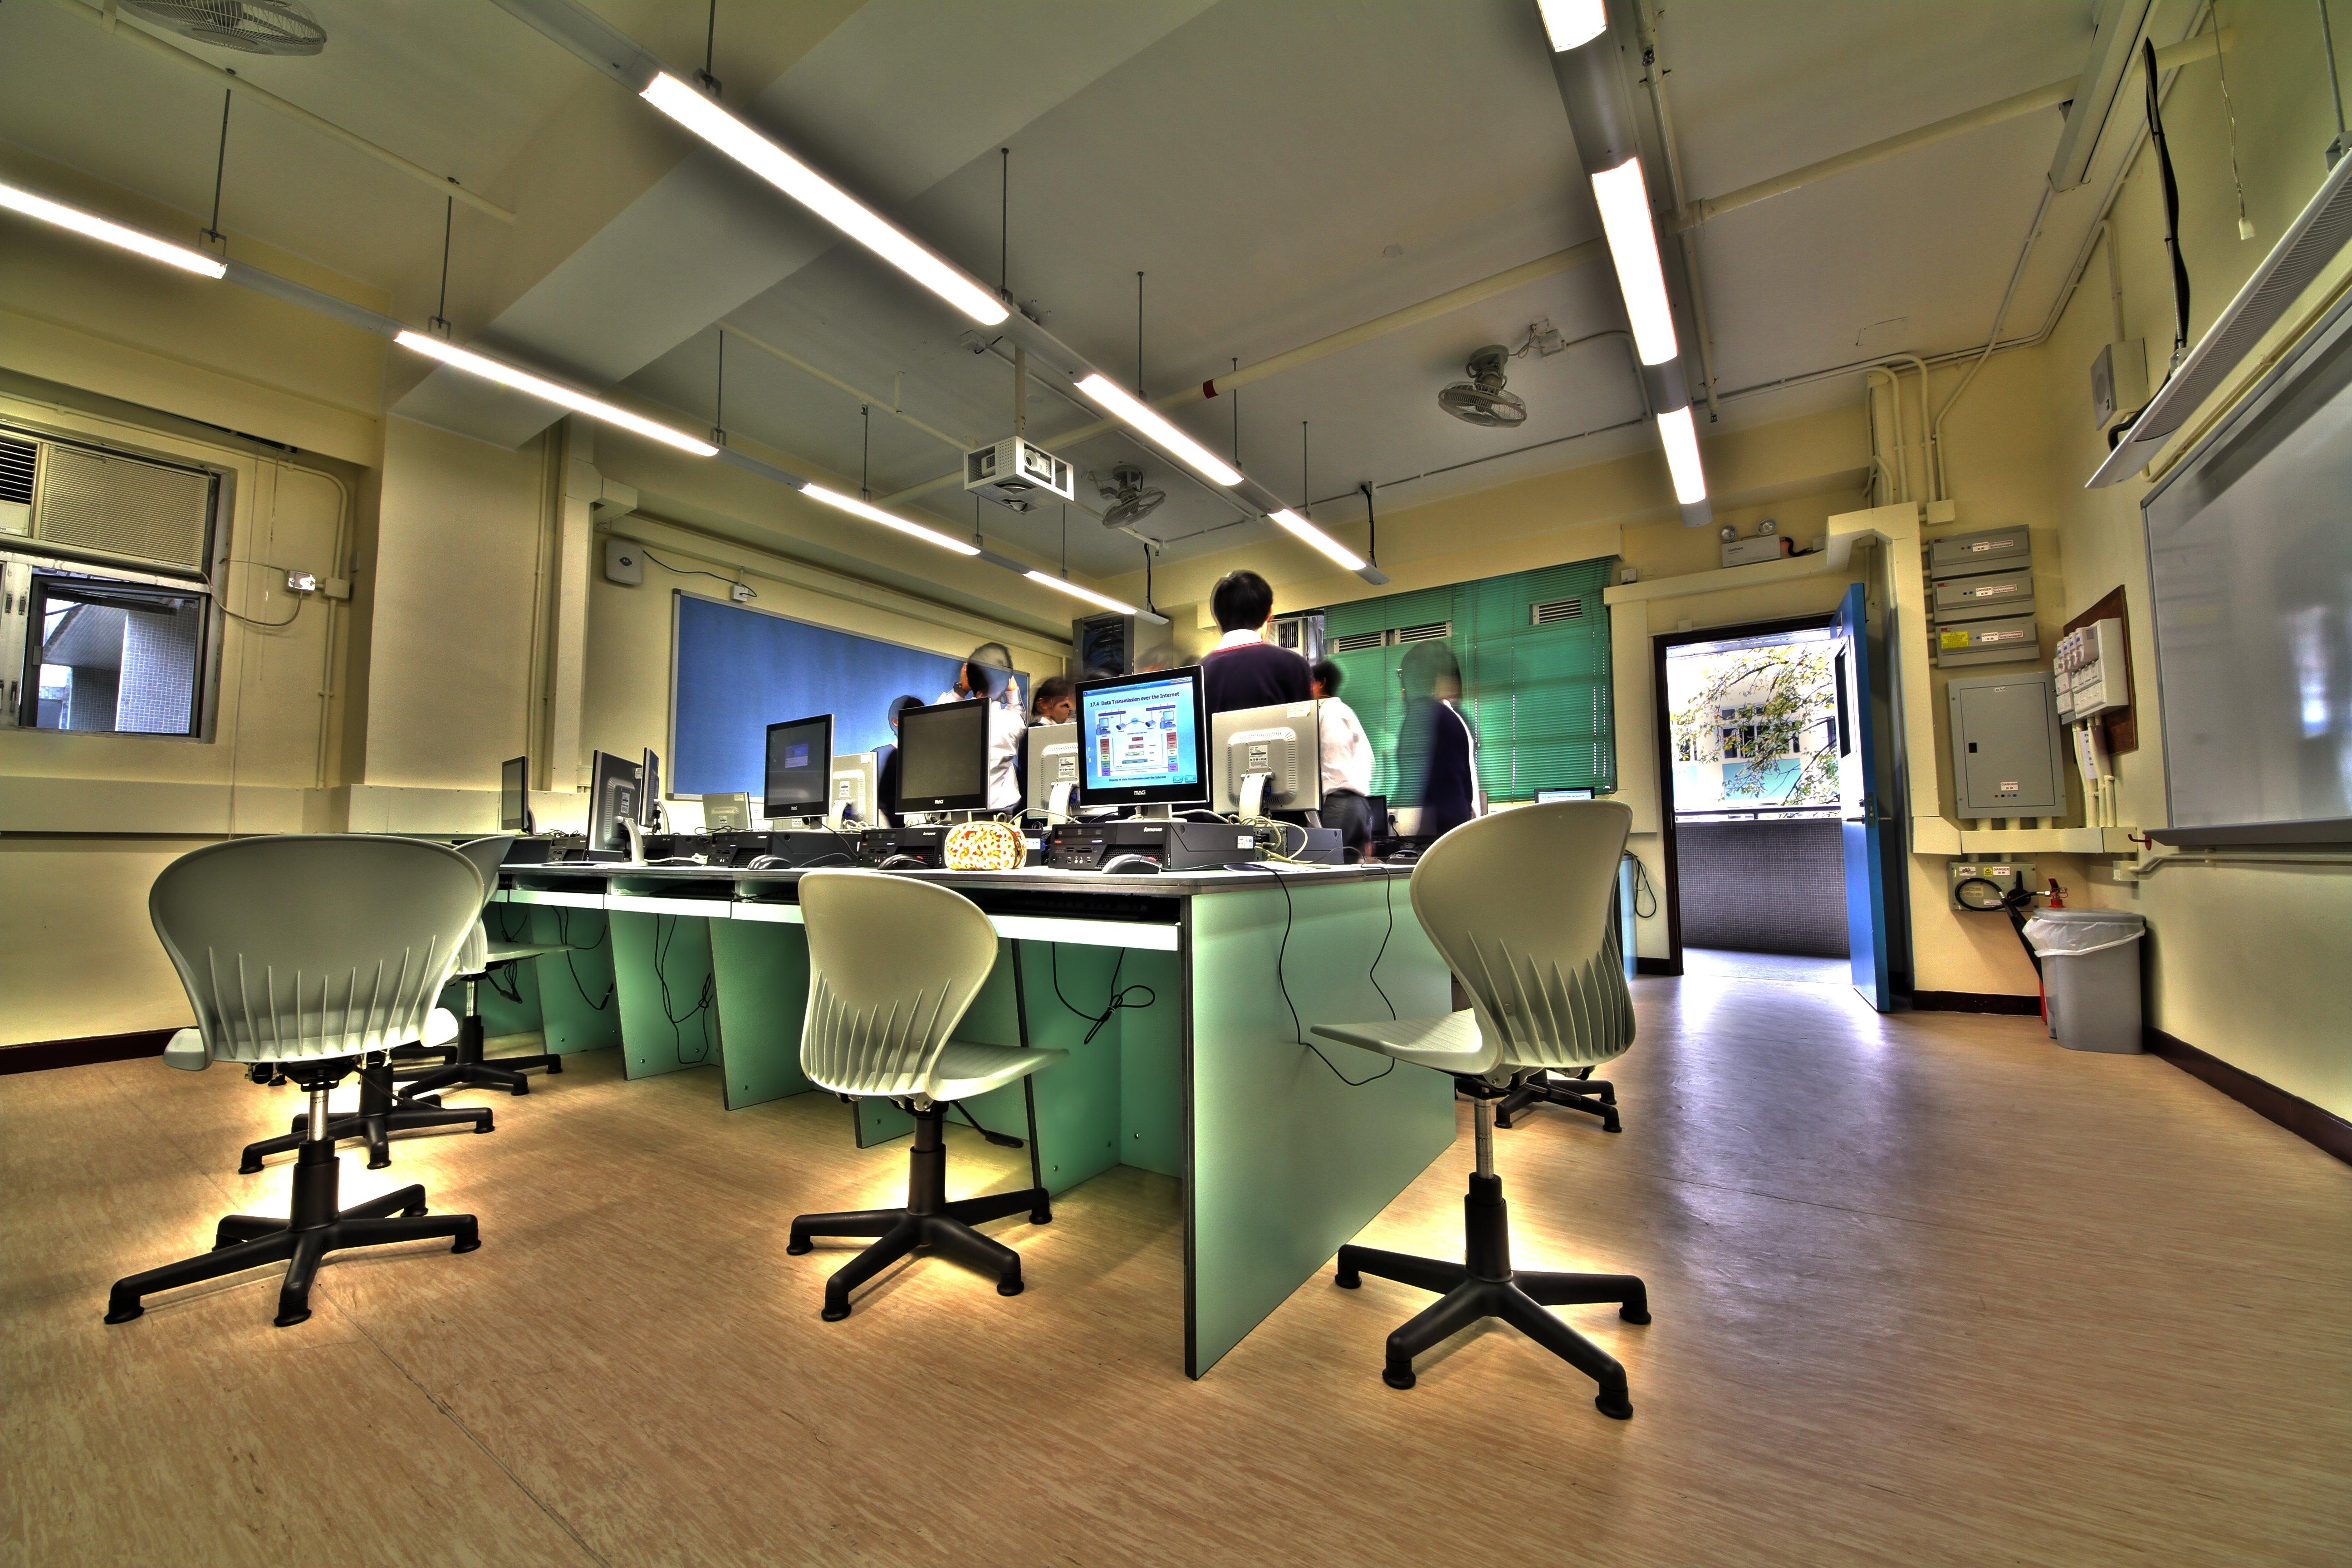 Room Size Computer ew Computer Room.jpg